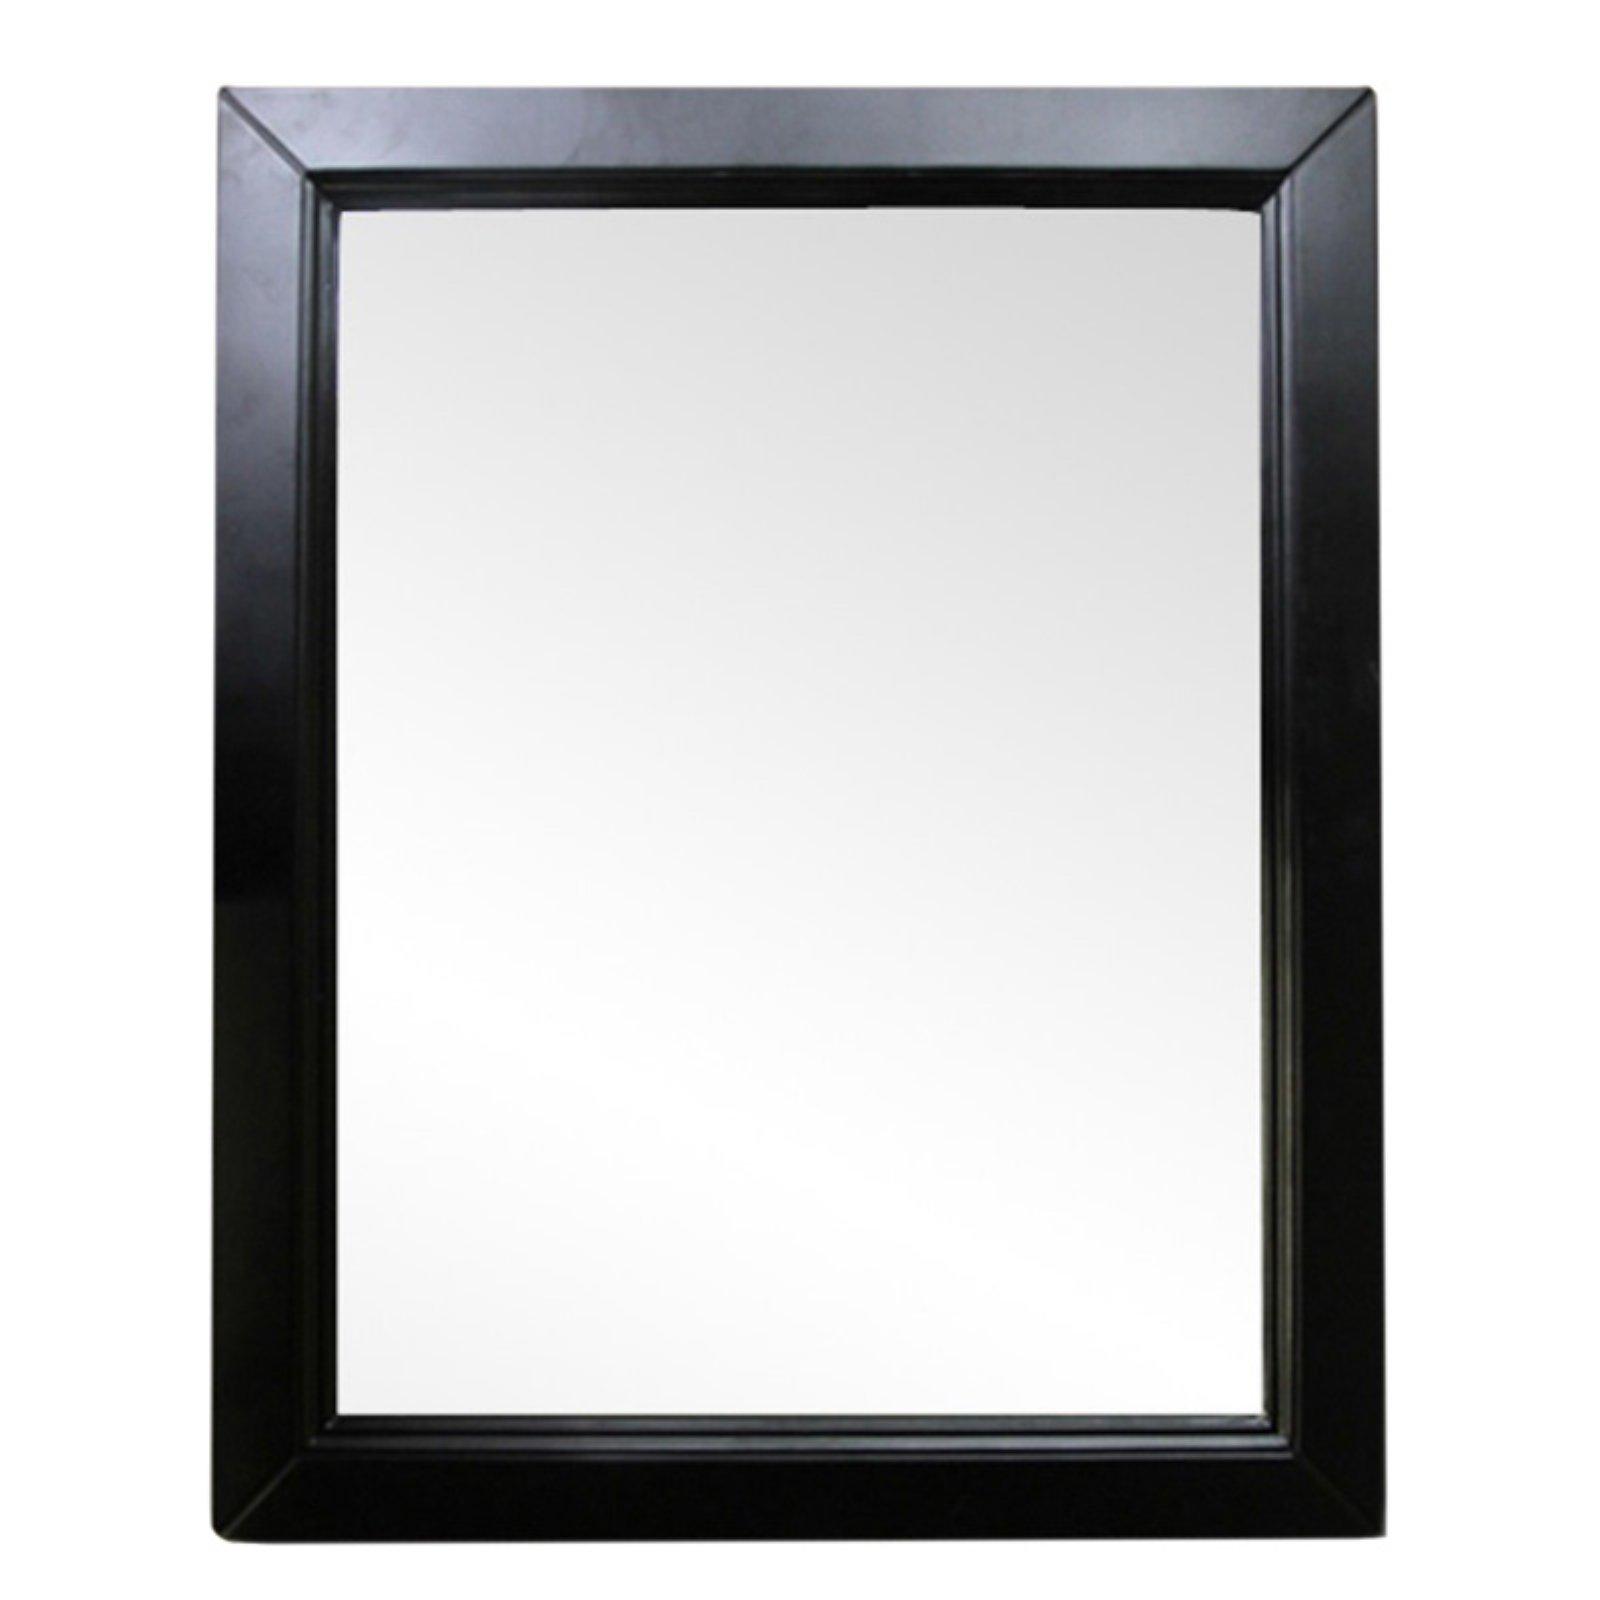 Bellaterra Home Mirror 30w X 36h In Wood Framed Mirror